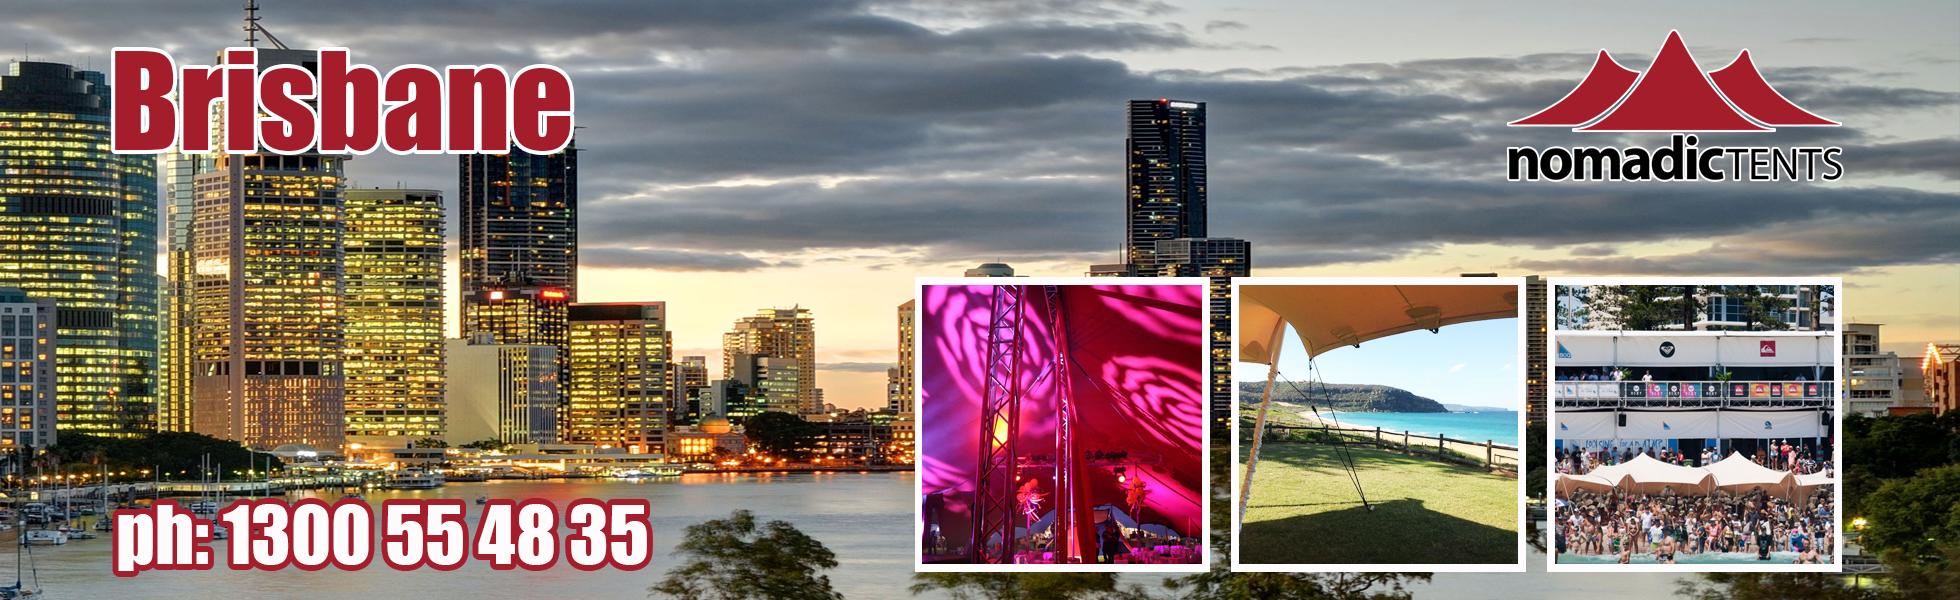 Nomadic Tents in Brisbane